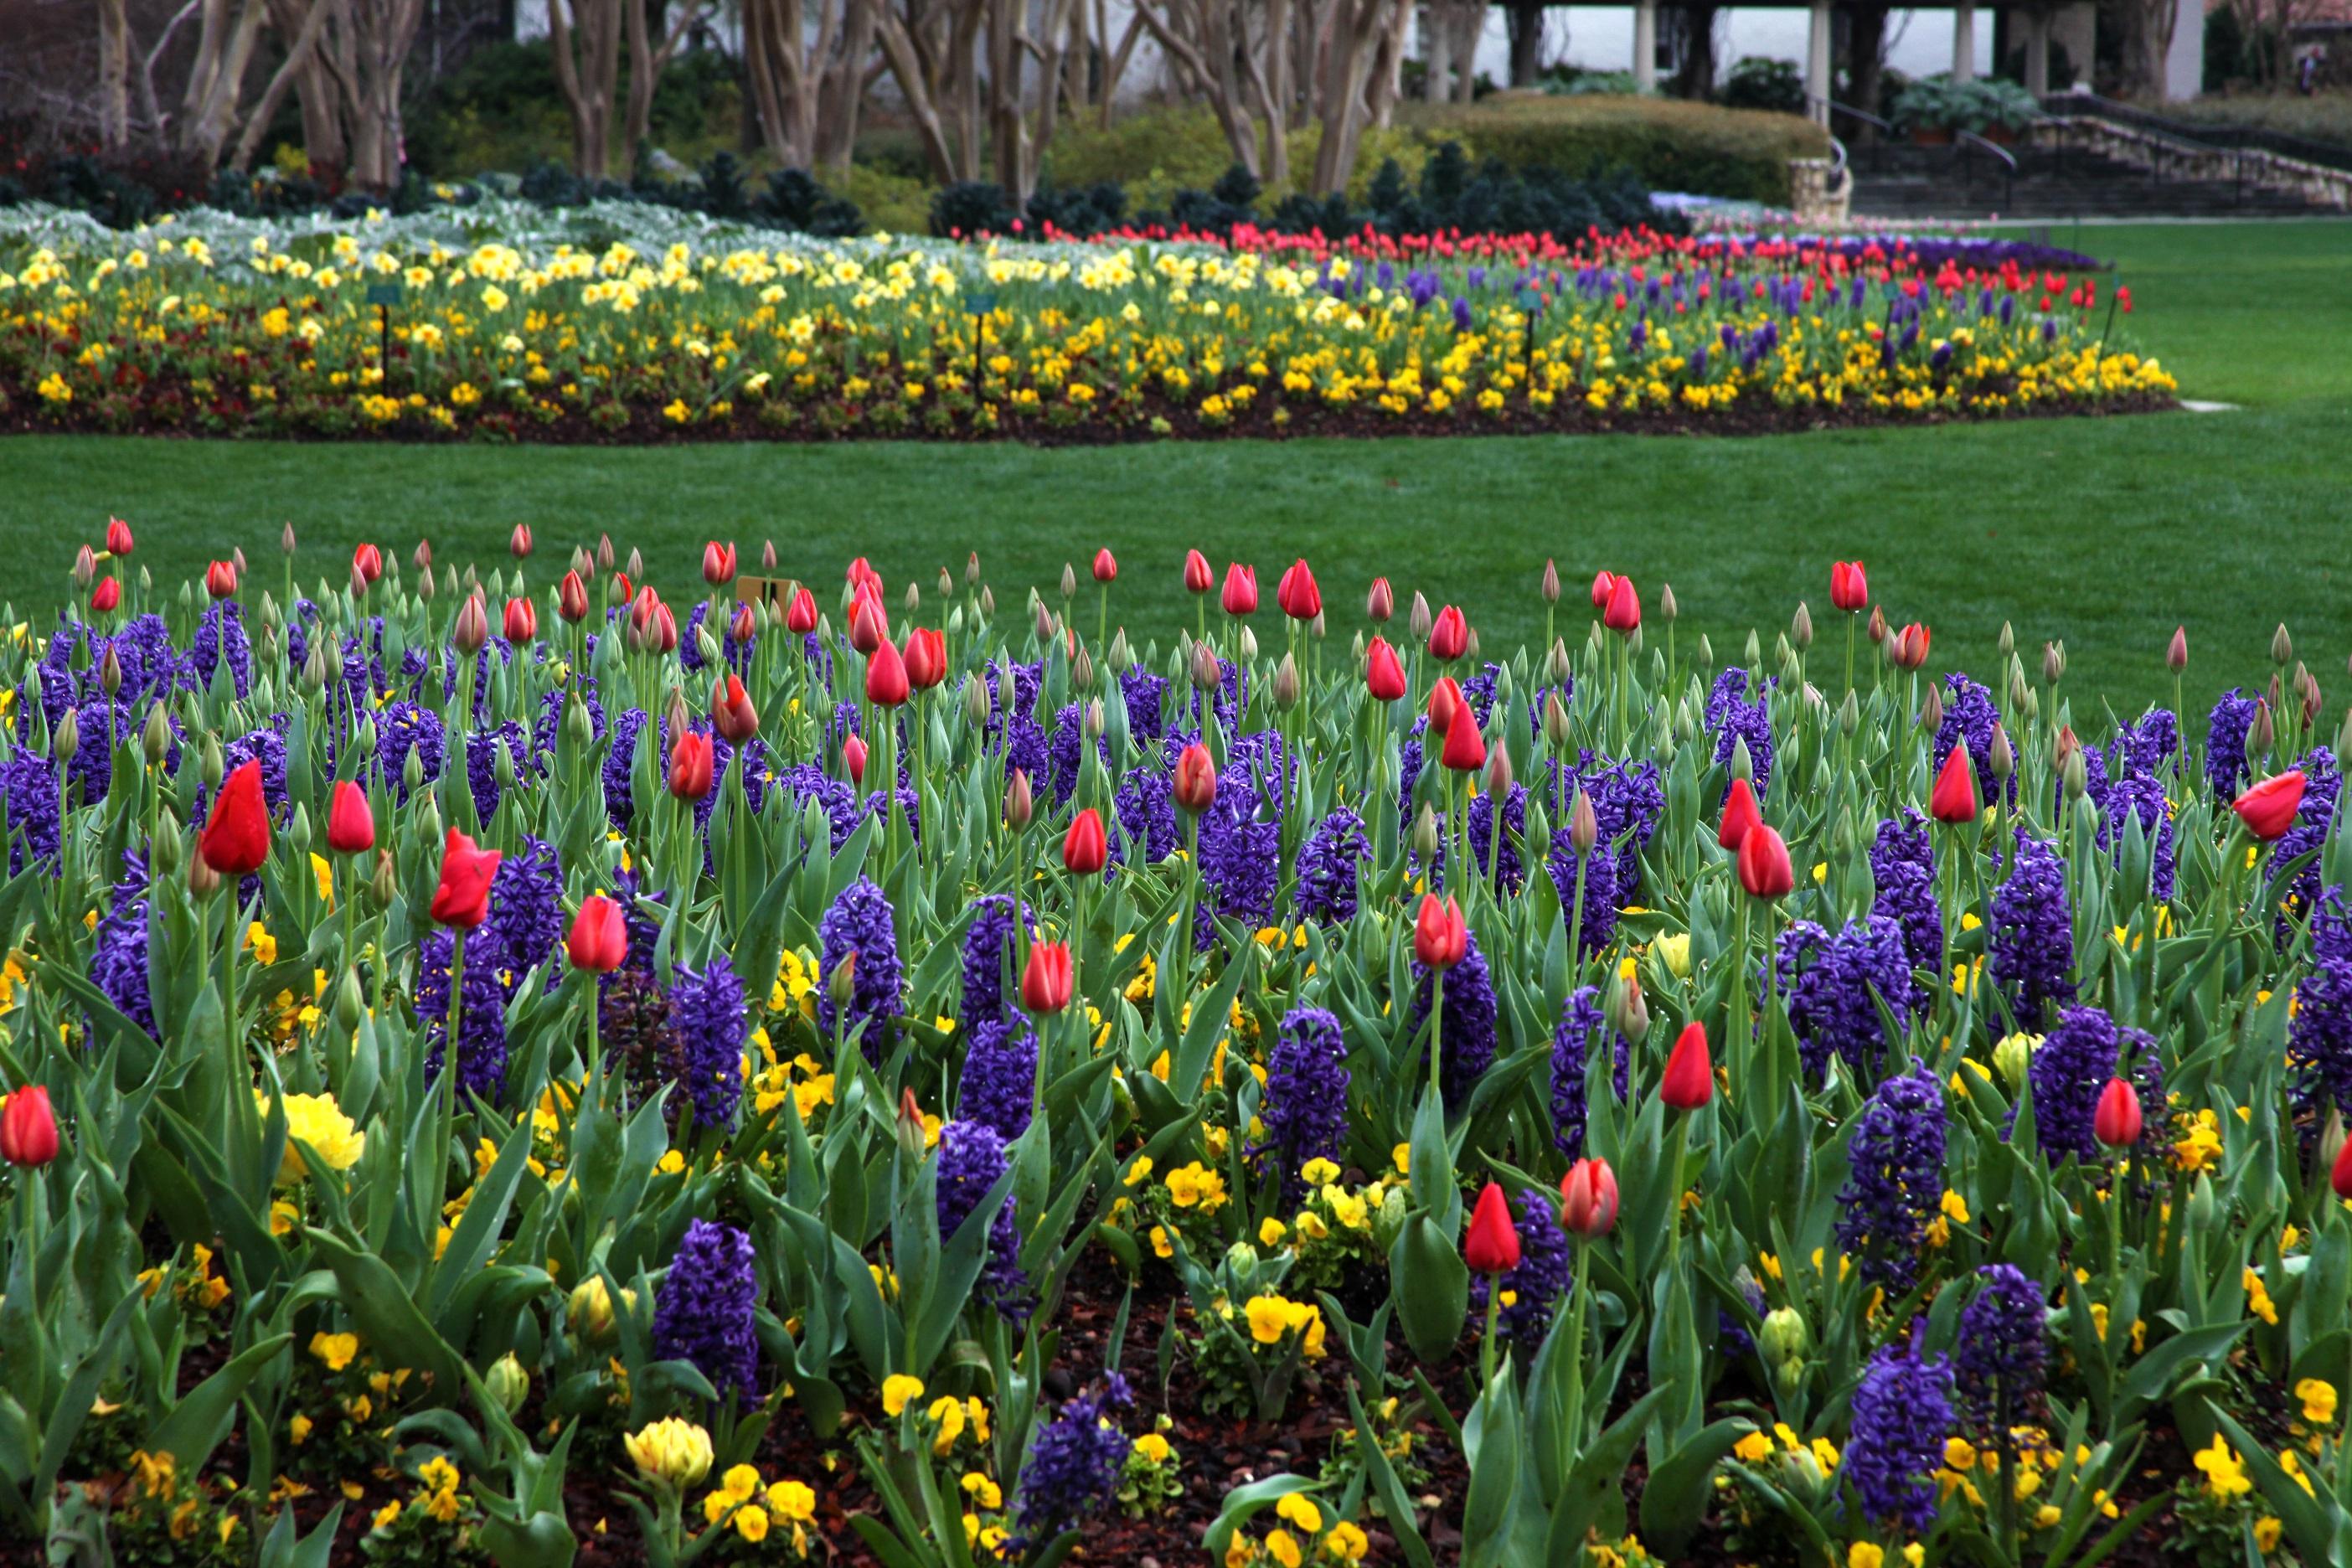 Botanical Gardens Membership Garden Club Membership Pittsburgh Botanic Garden Missouri